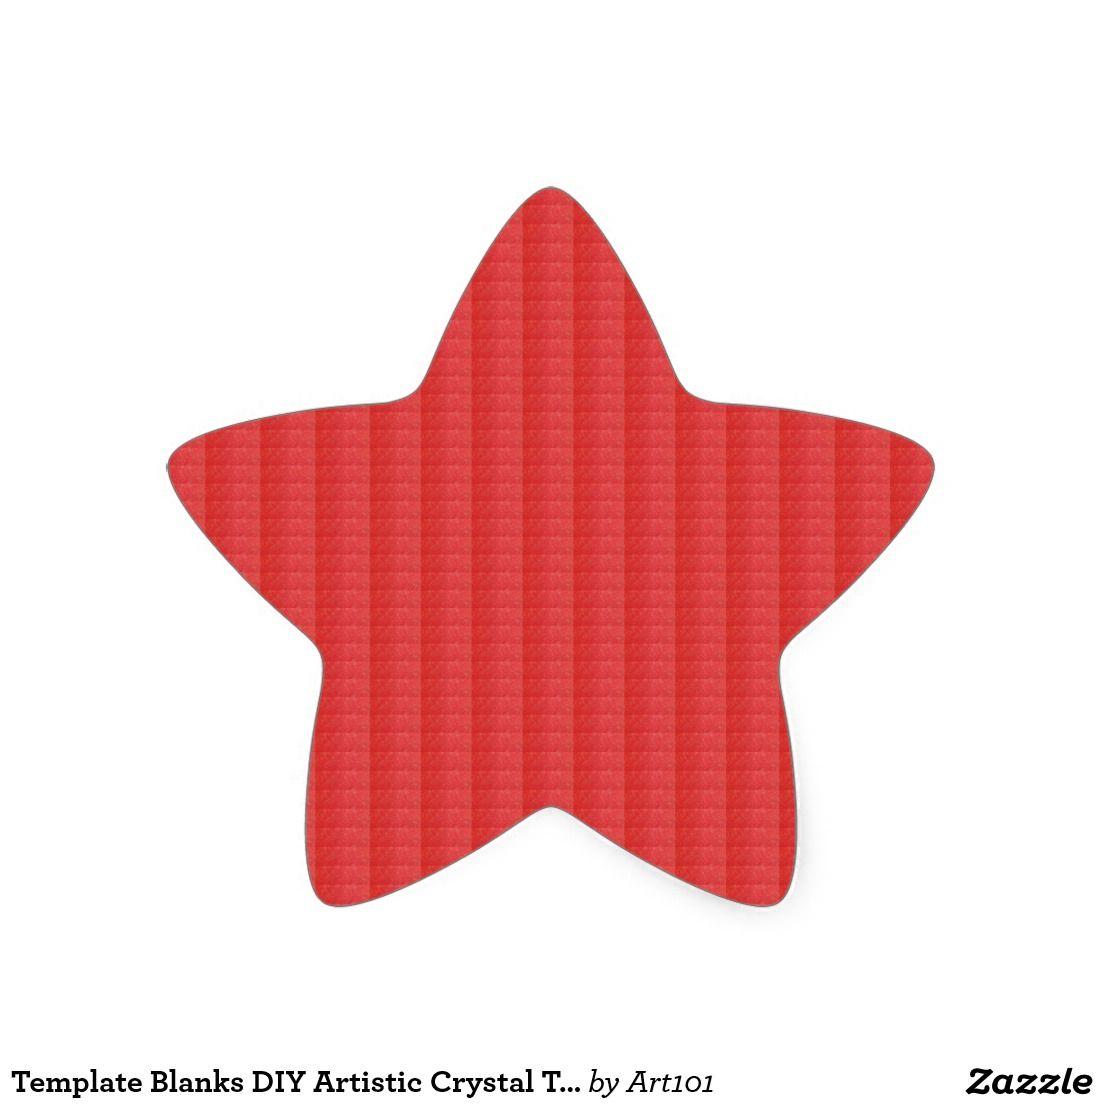 Template Blanks DIY Artistic Crystal Texture + TXT Star Sticker ...